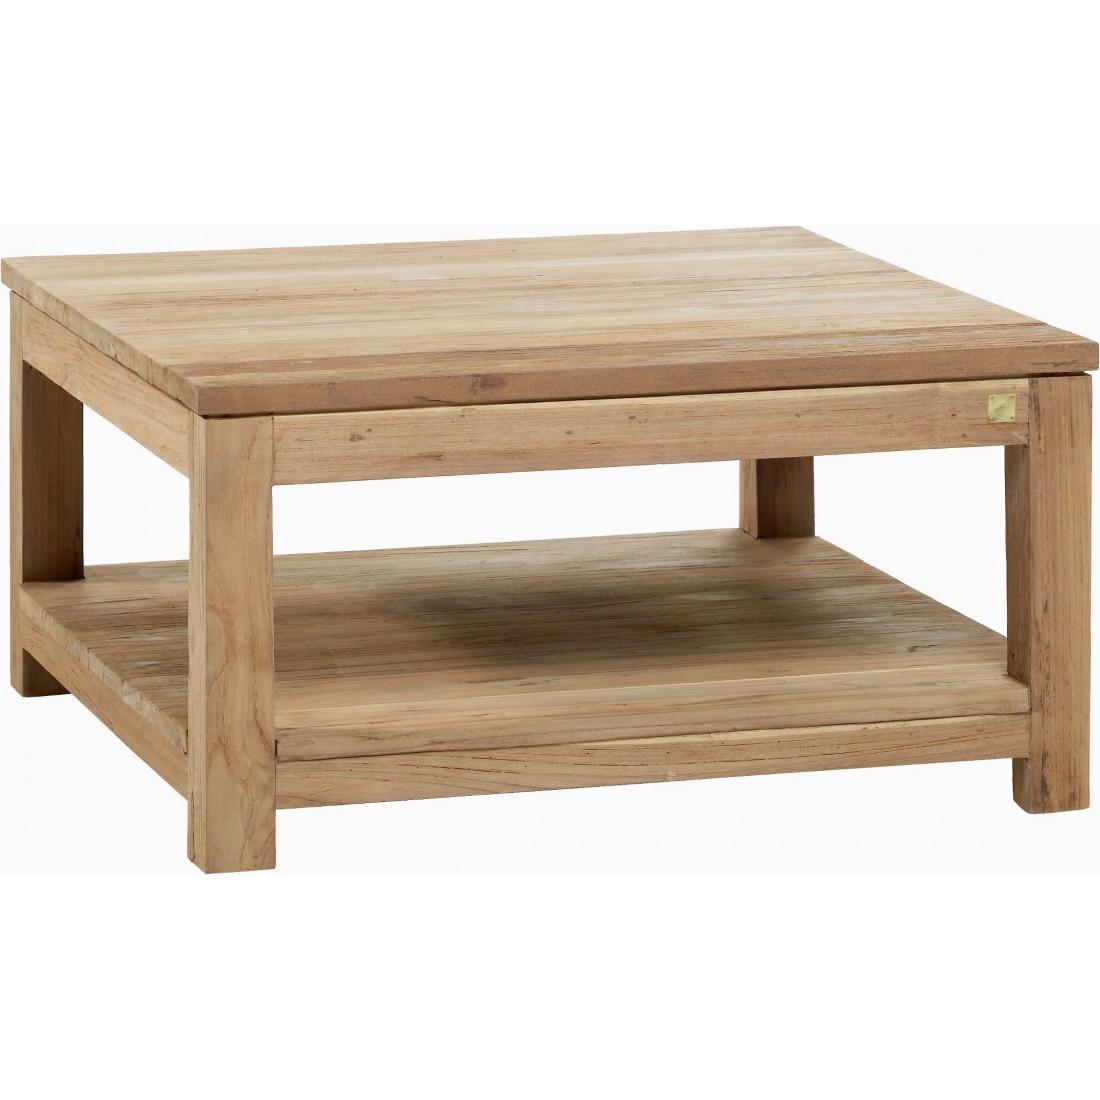 Teak coffee table drift 80x80 for Coussin exterieur 80x80